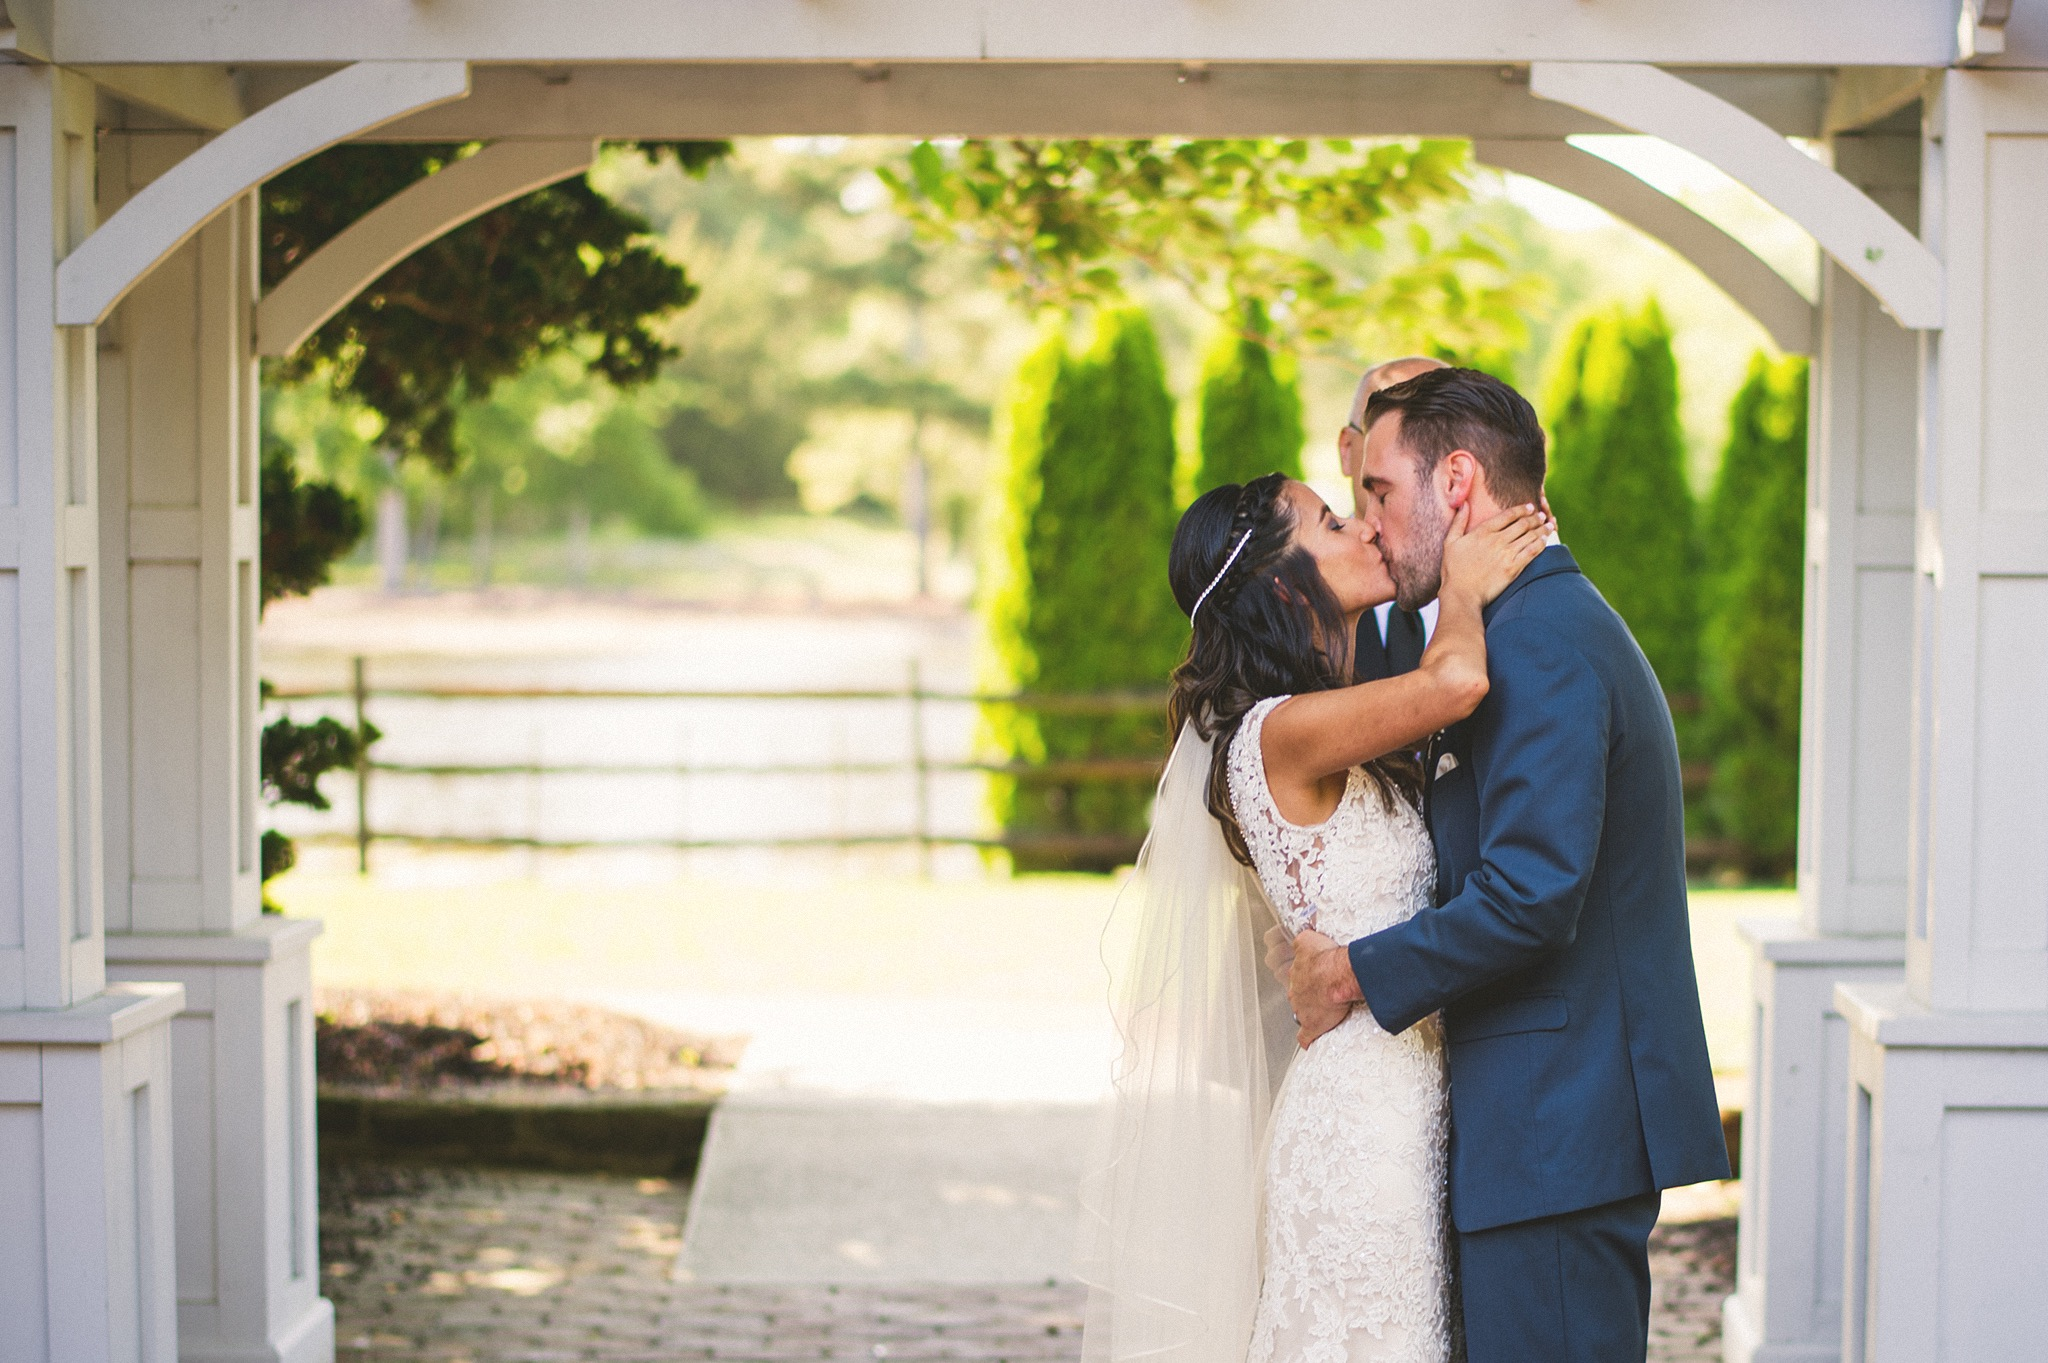 54-first-kiss-wedding-photos.jpg